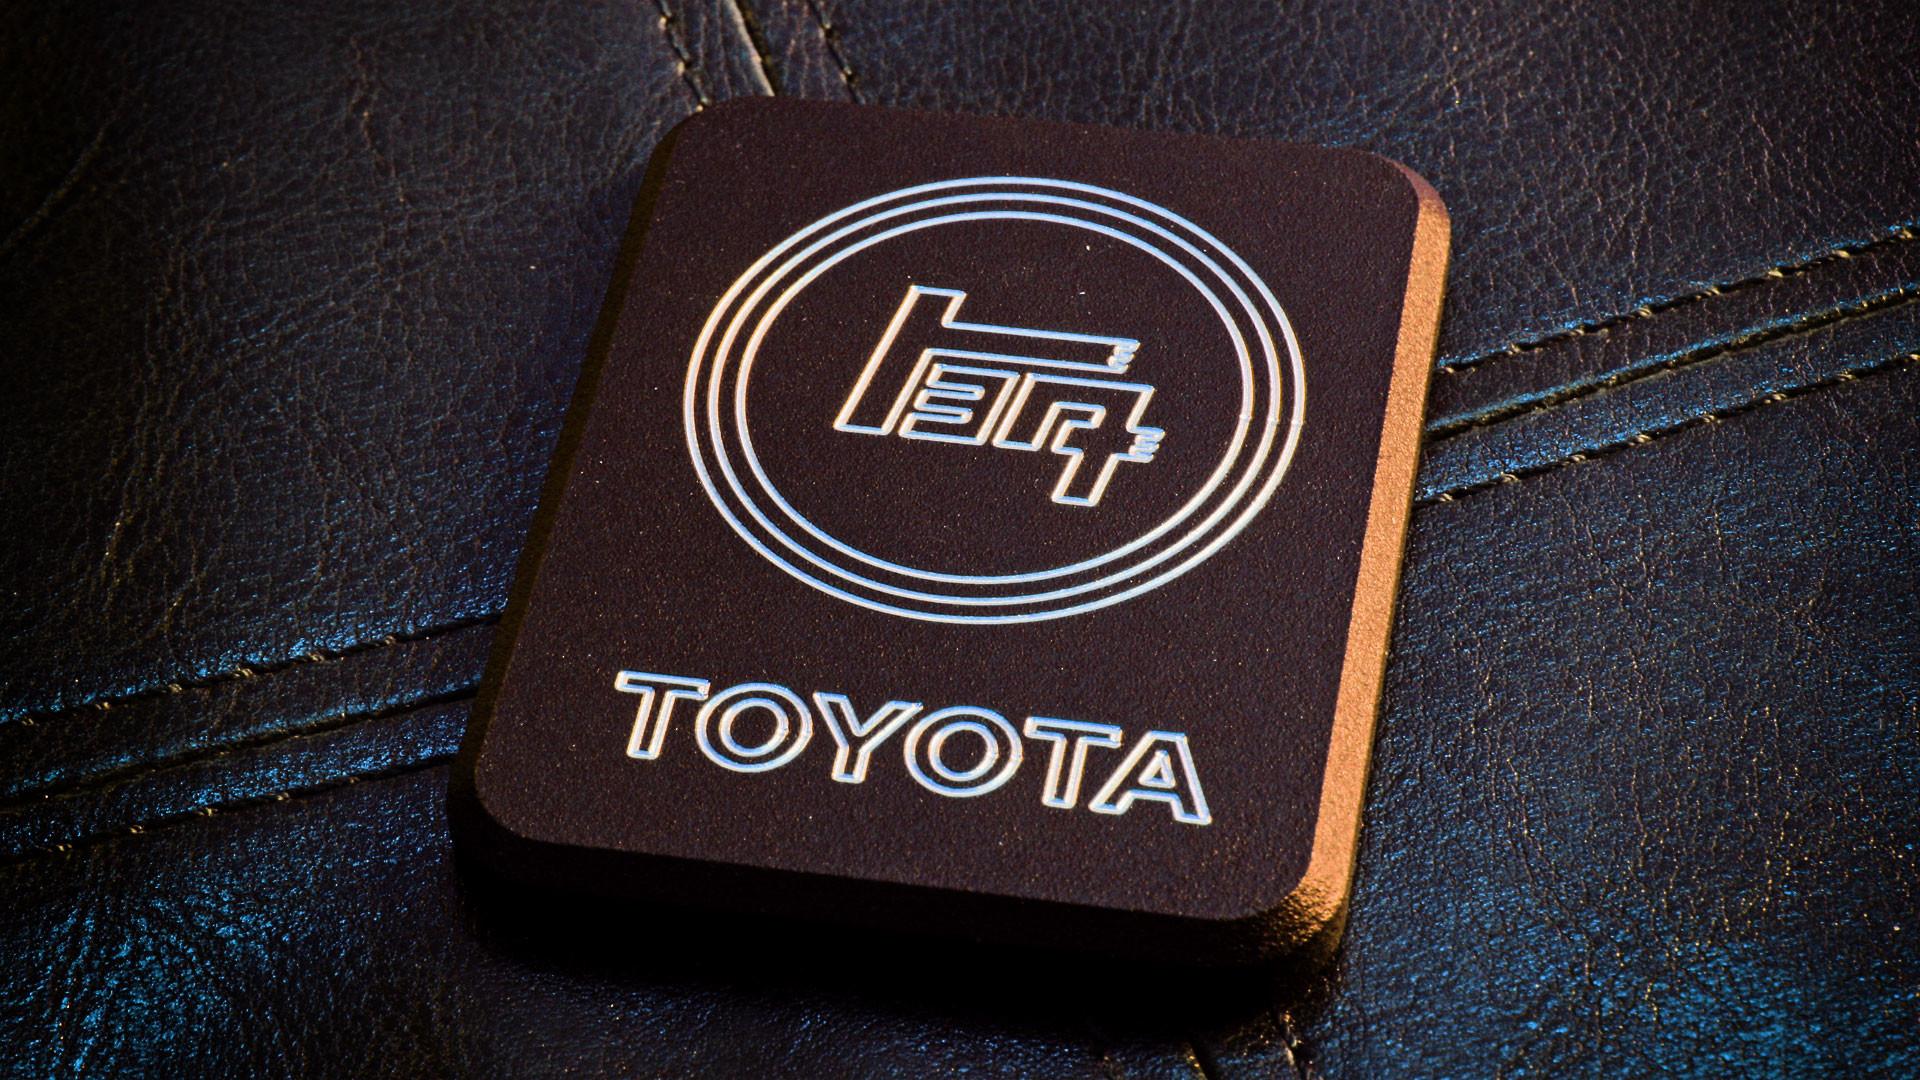 classic-toyota-logo-toyoda-badge